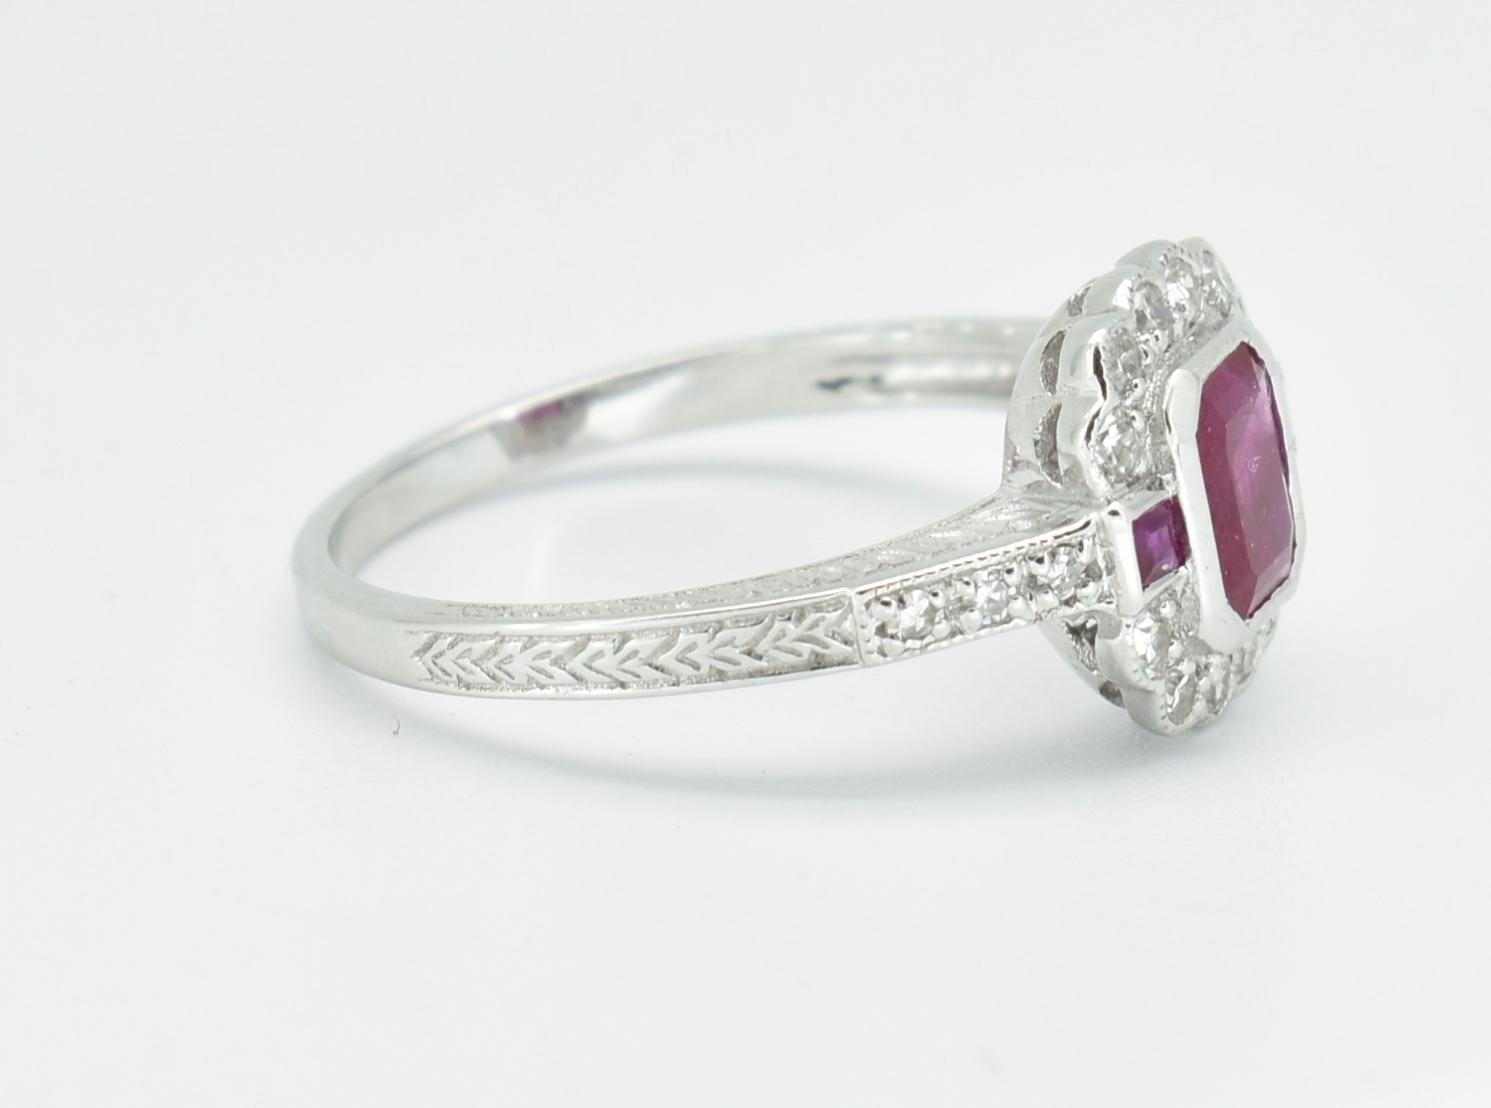 18CT WHITE GOLD RUBY & DIAMOND RING - Image 3 of 5